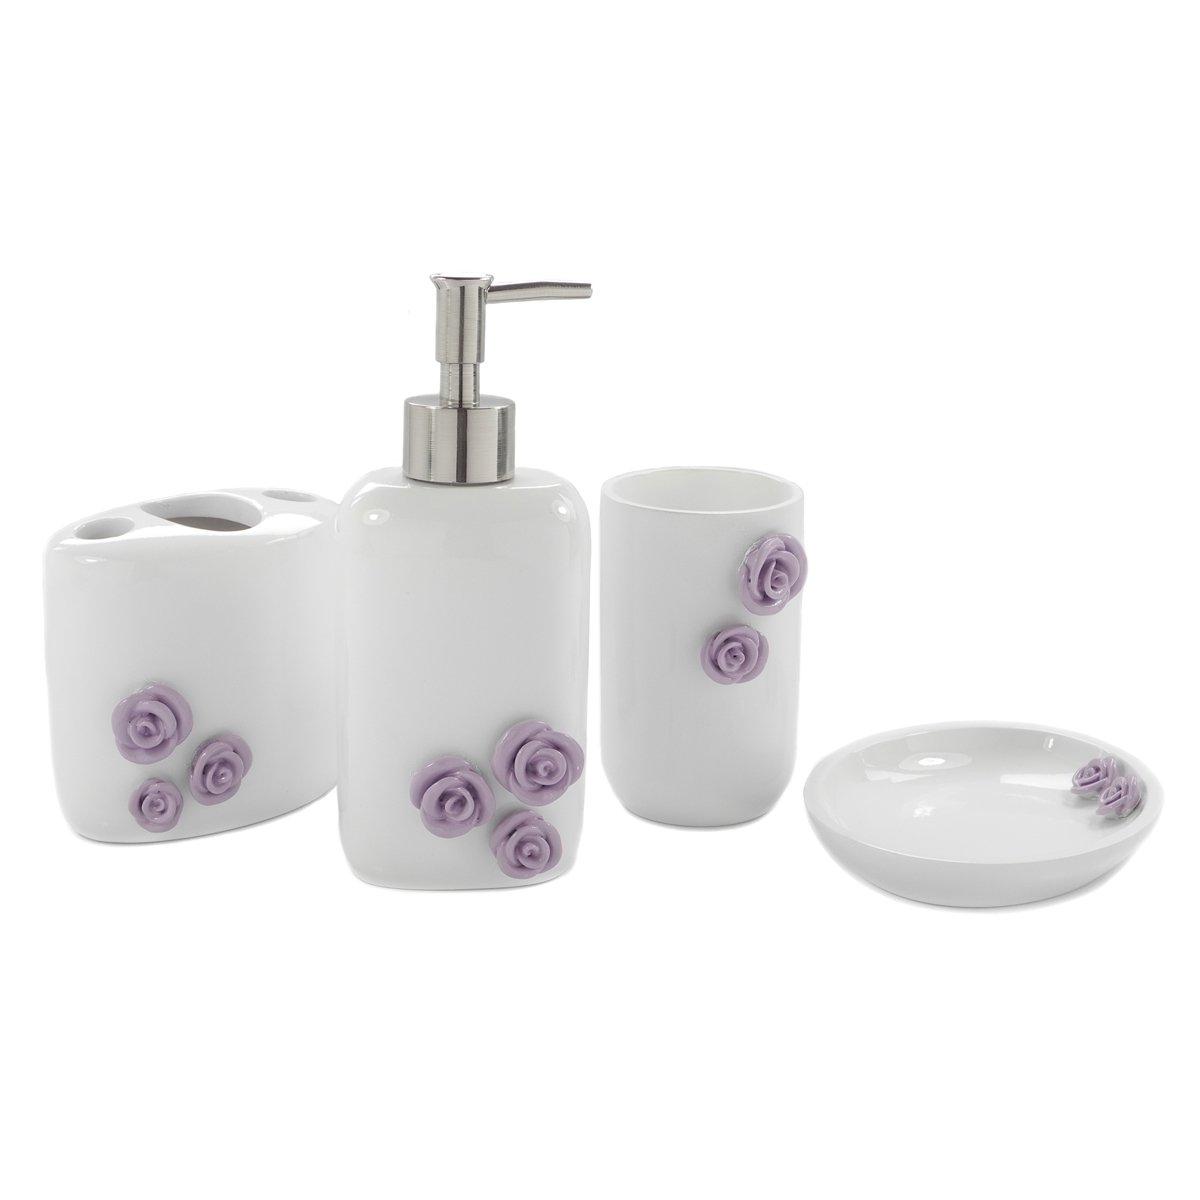 Dream bath purple rose bath ensemble 4 piece bathroom for Fancy bath accessories